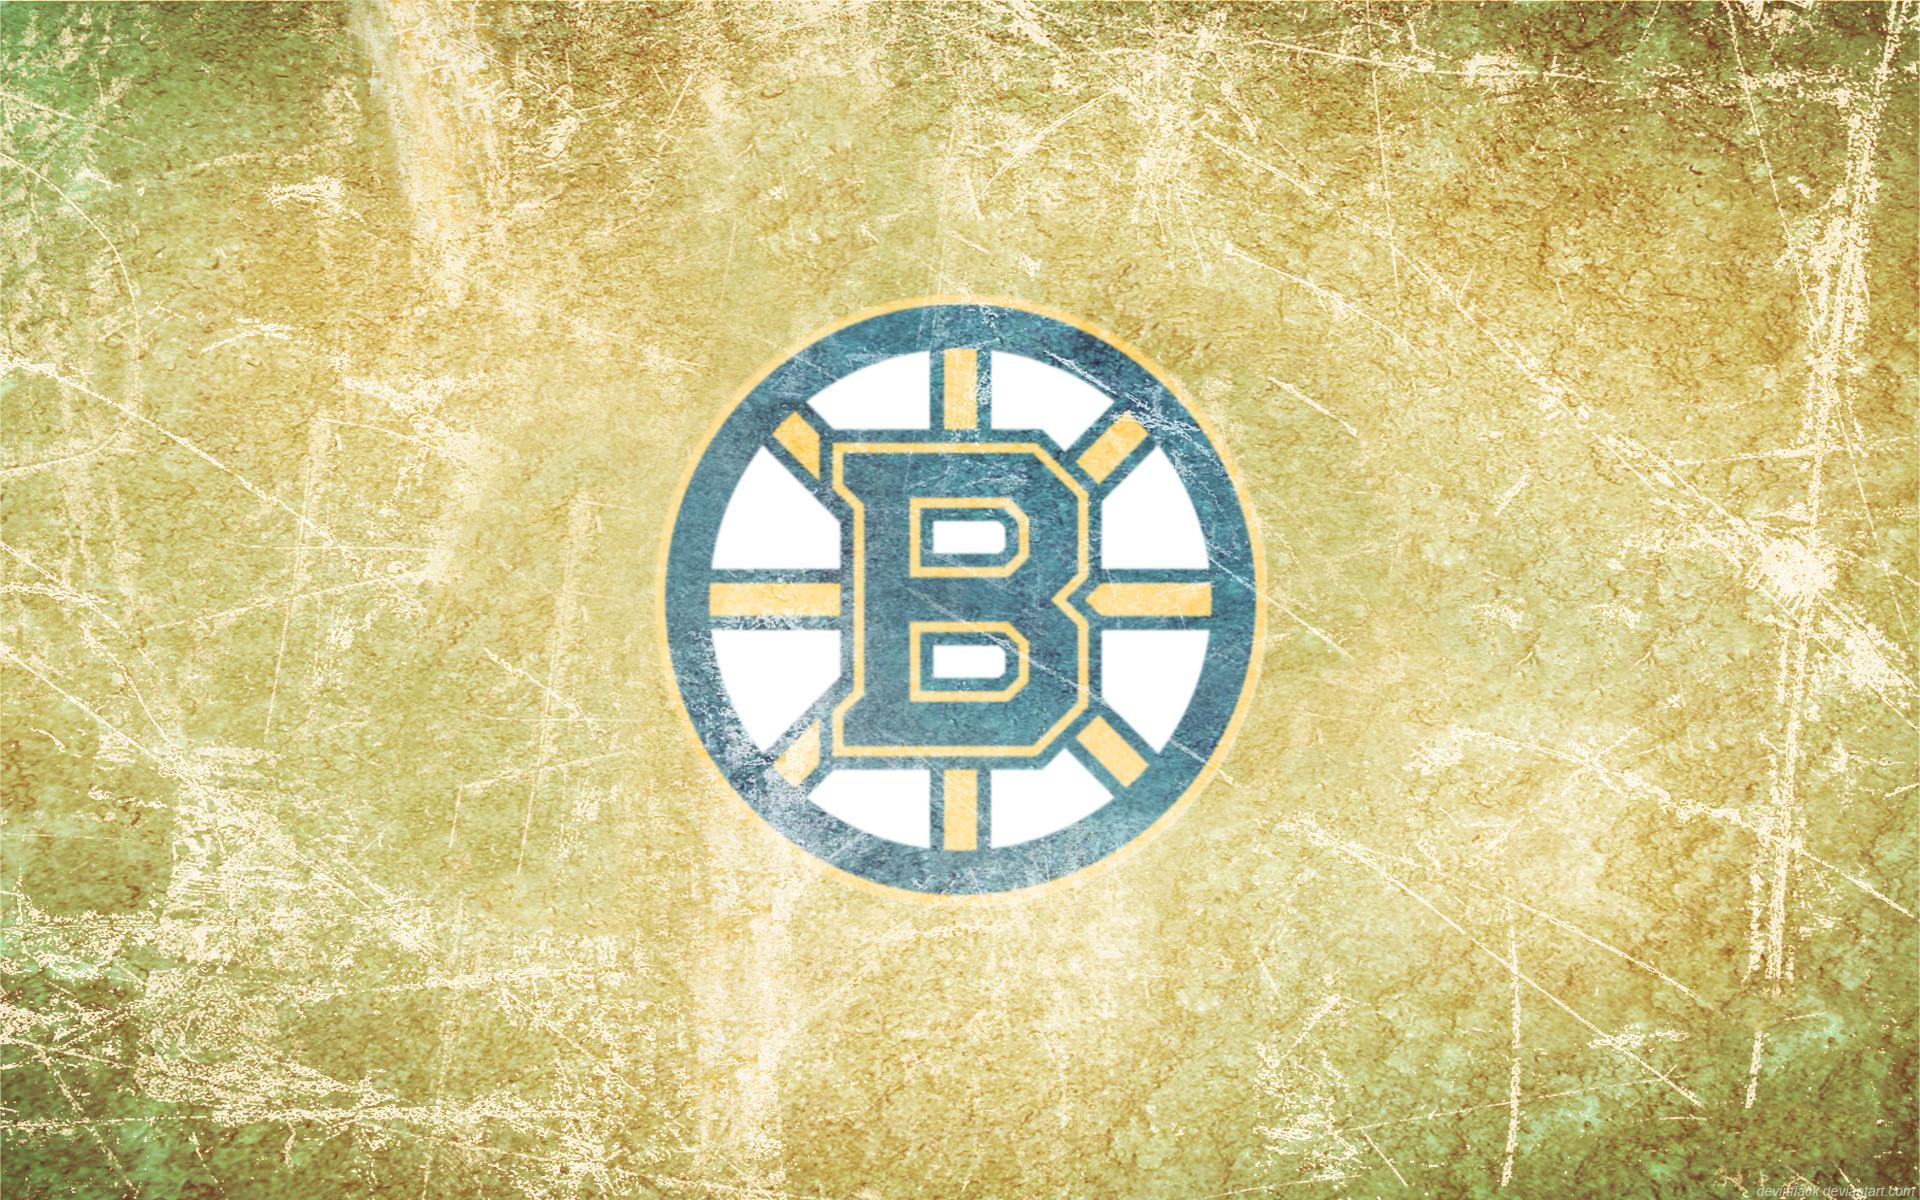 Bruins Updated Ice Wallpaper by DevinFlack on DeviantArt